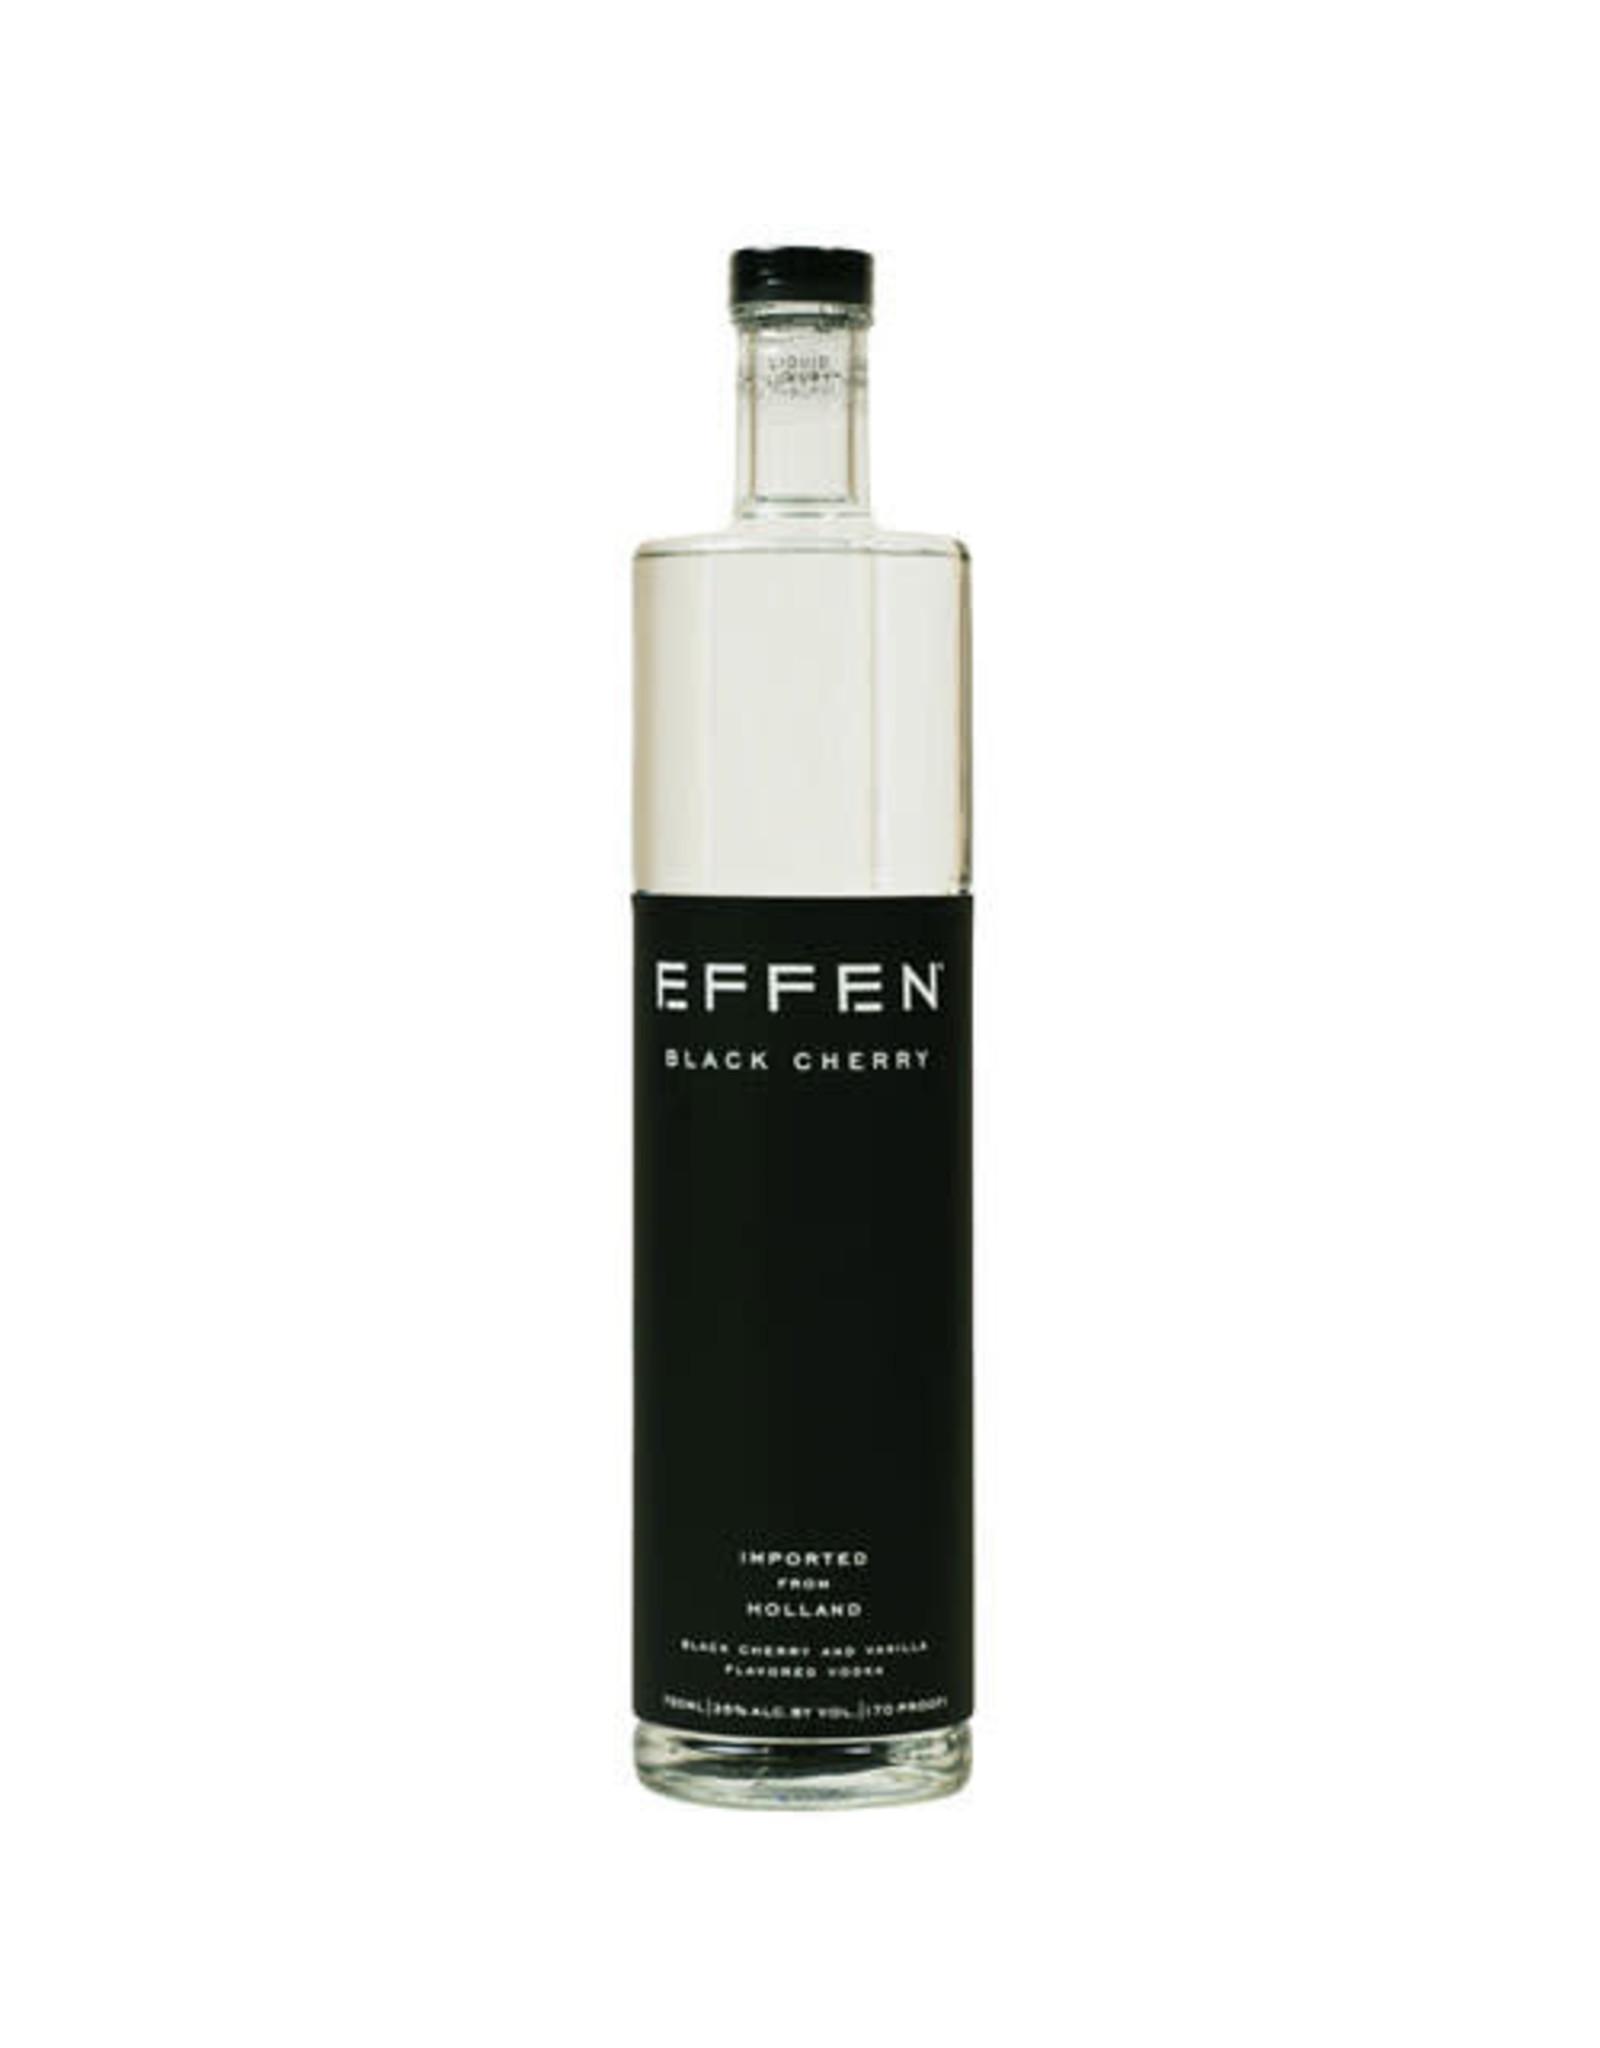 EFFEN BLACK CHERRY VODKA 750ml